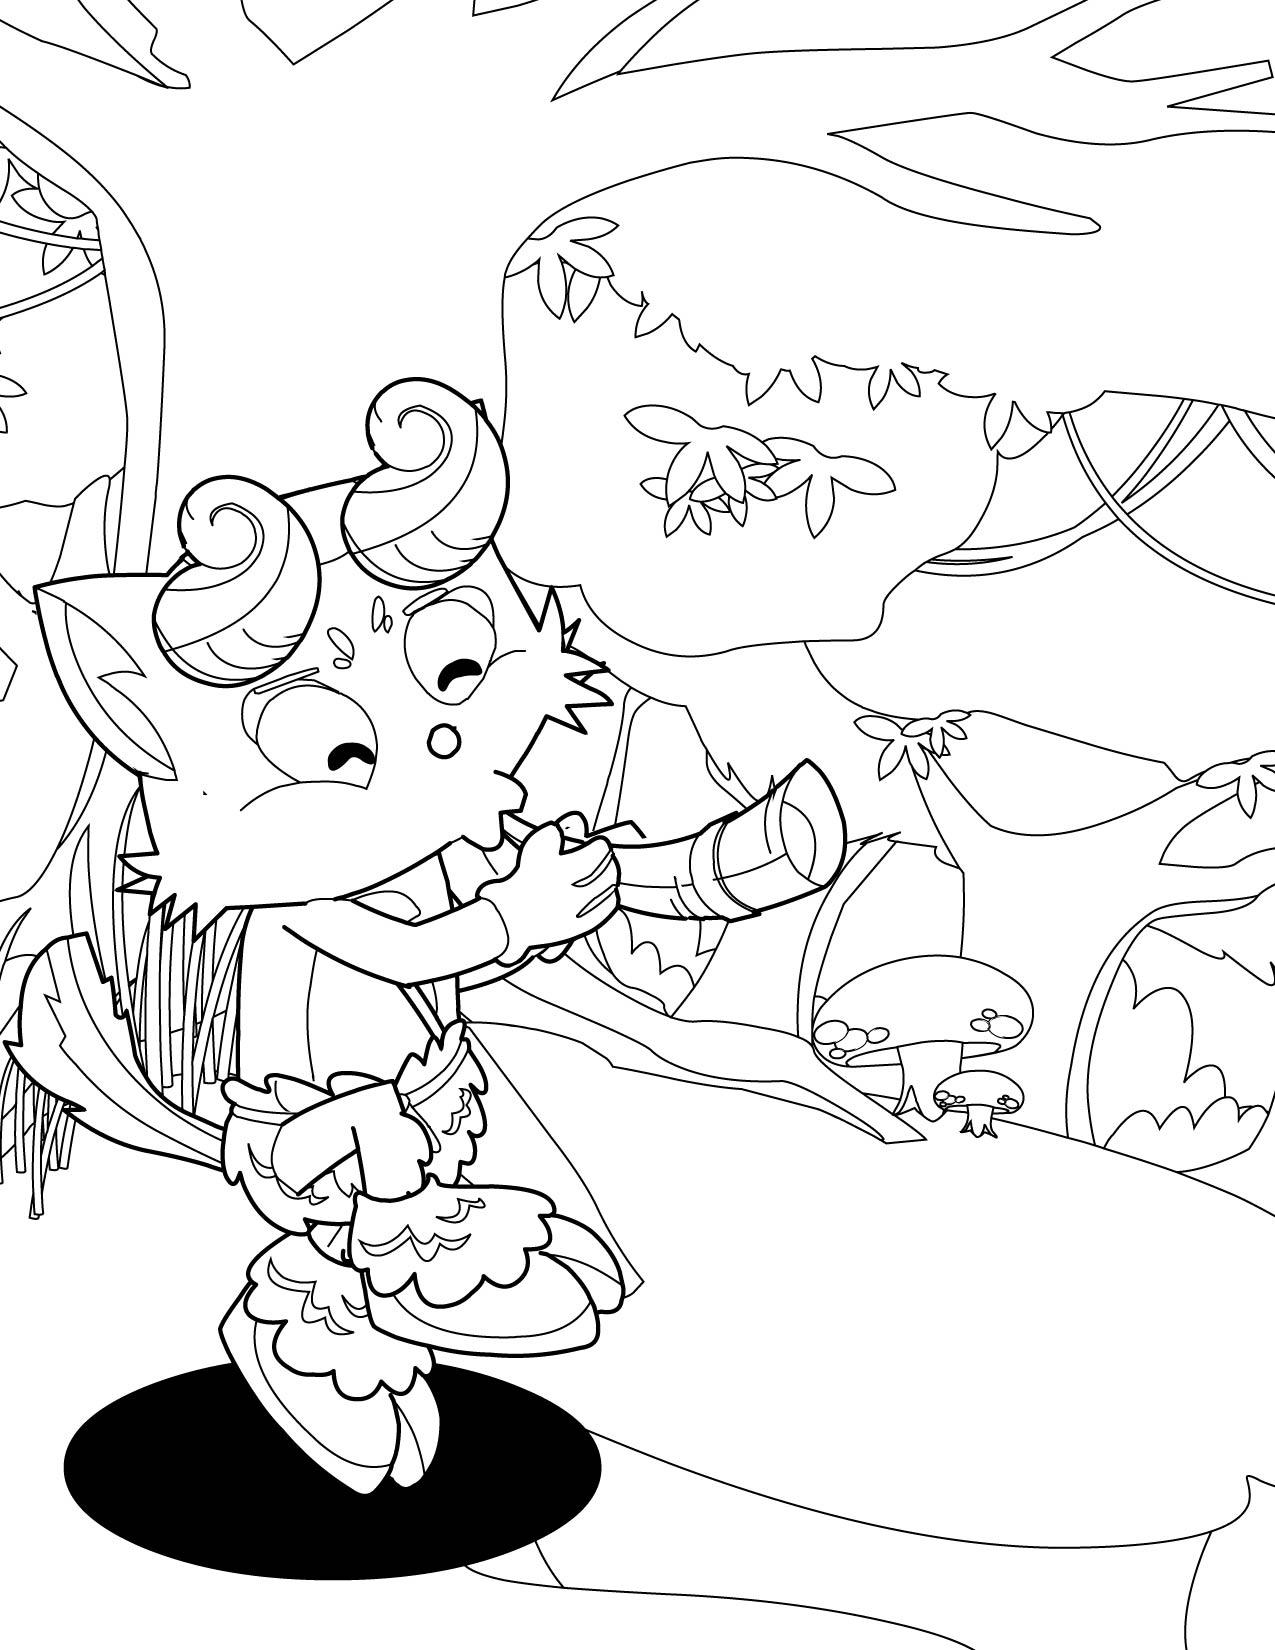 Satyr coloring #3, Download drawings